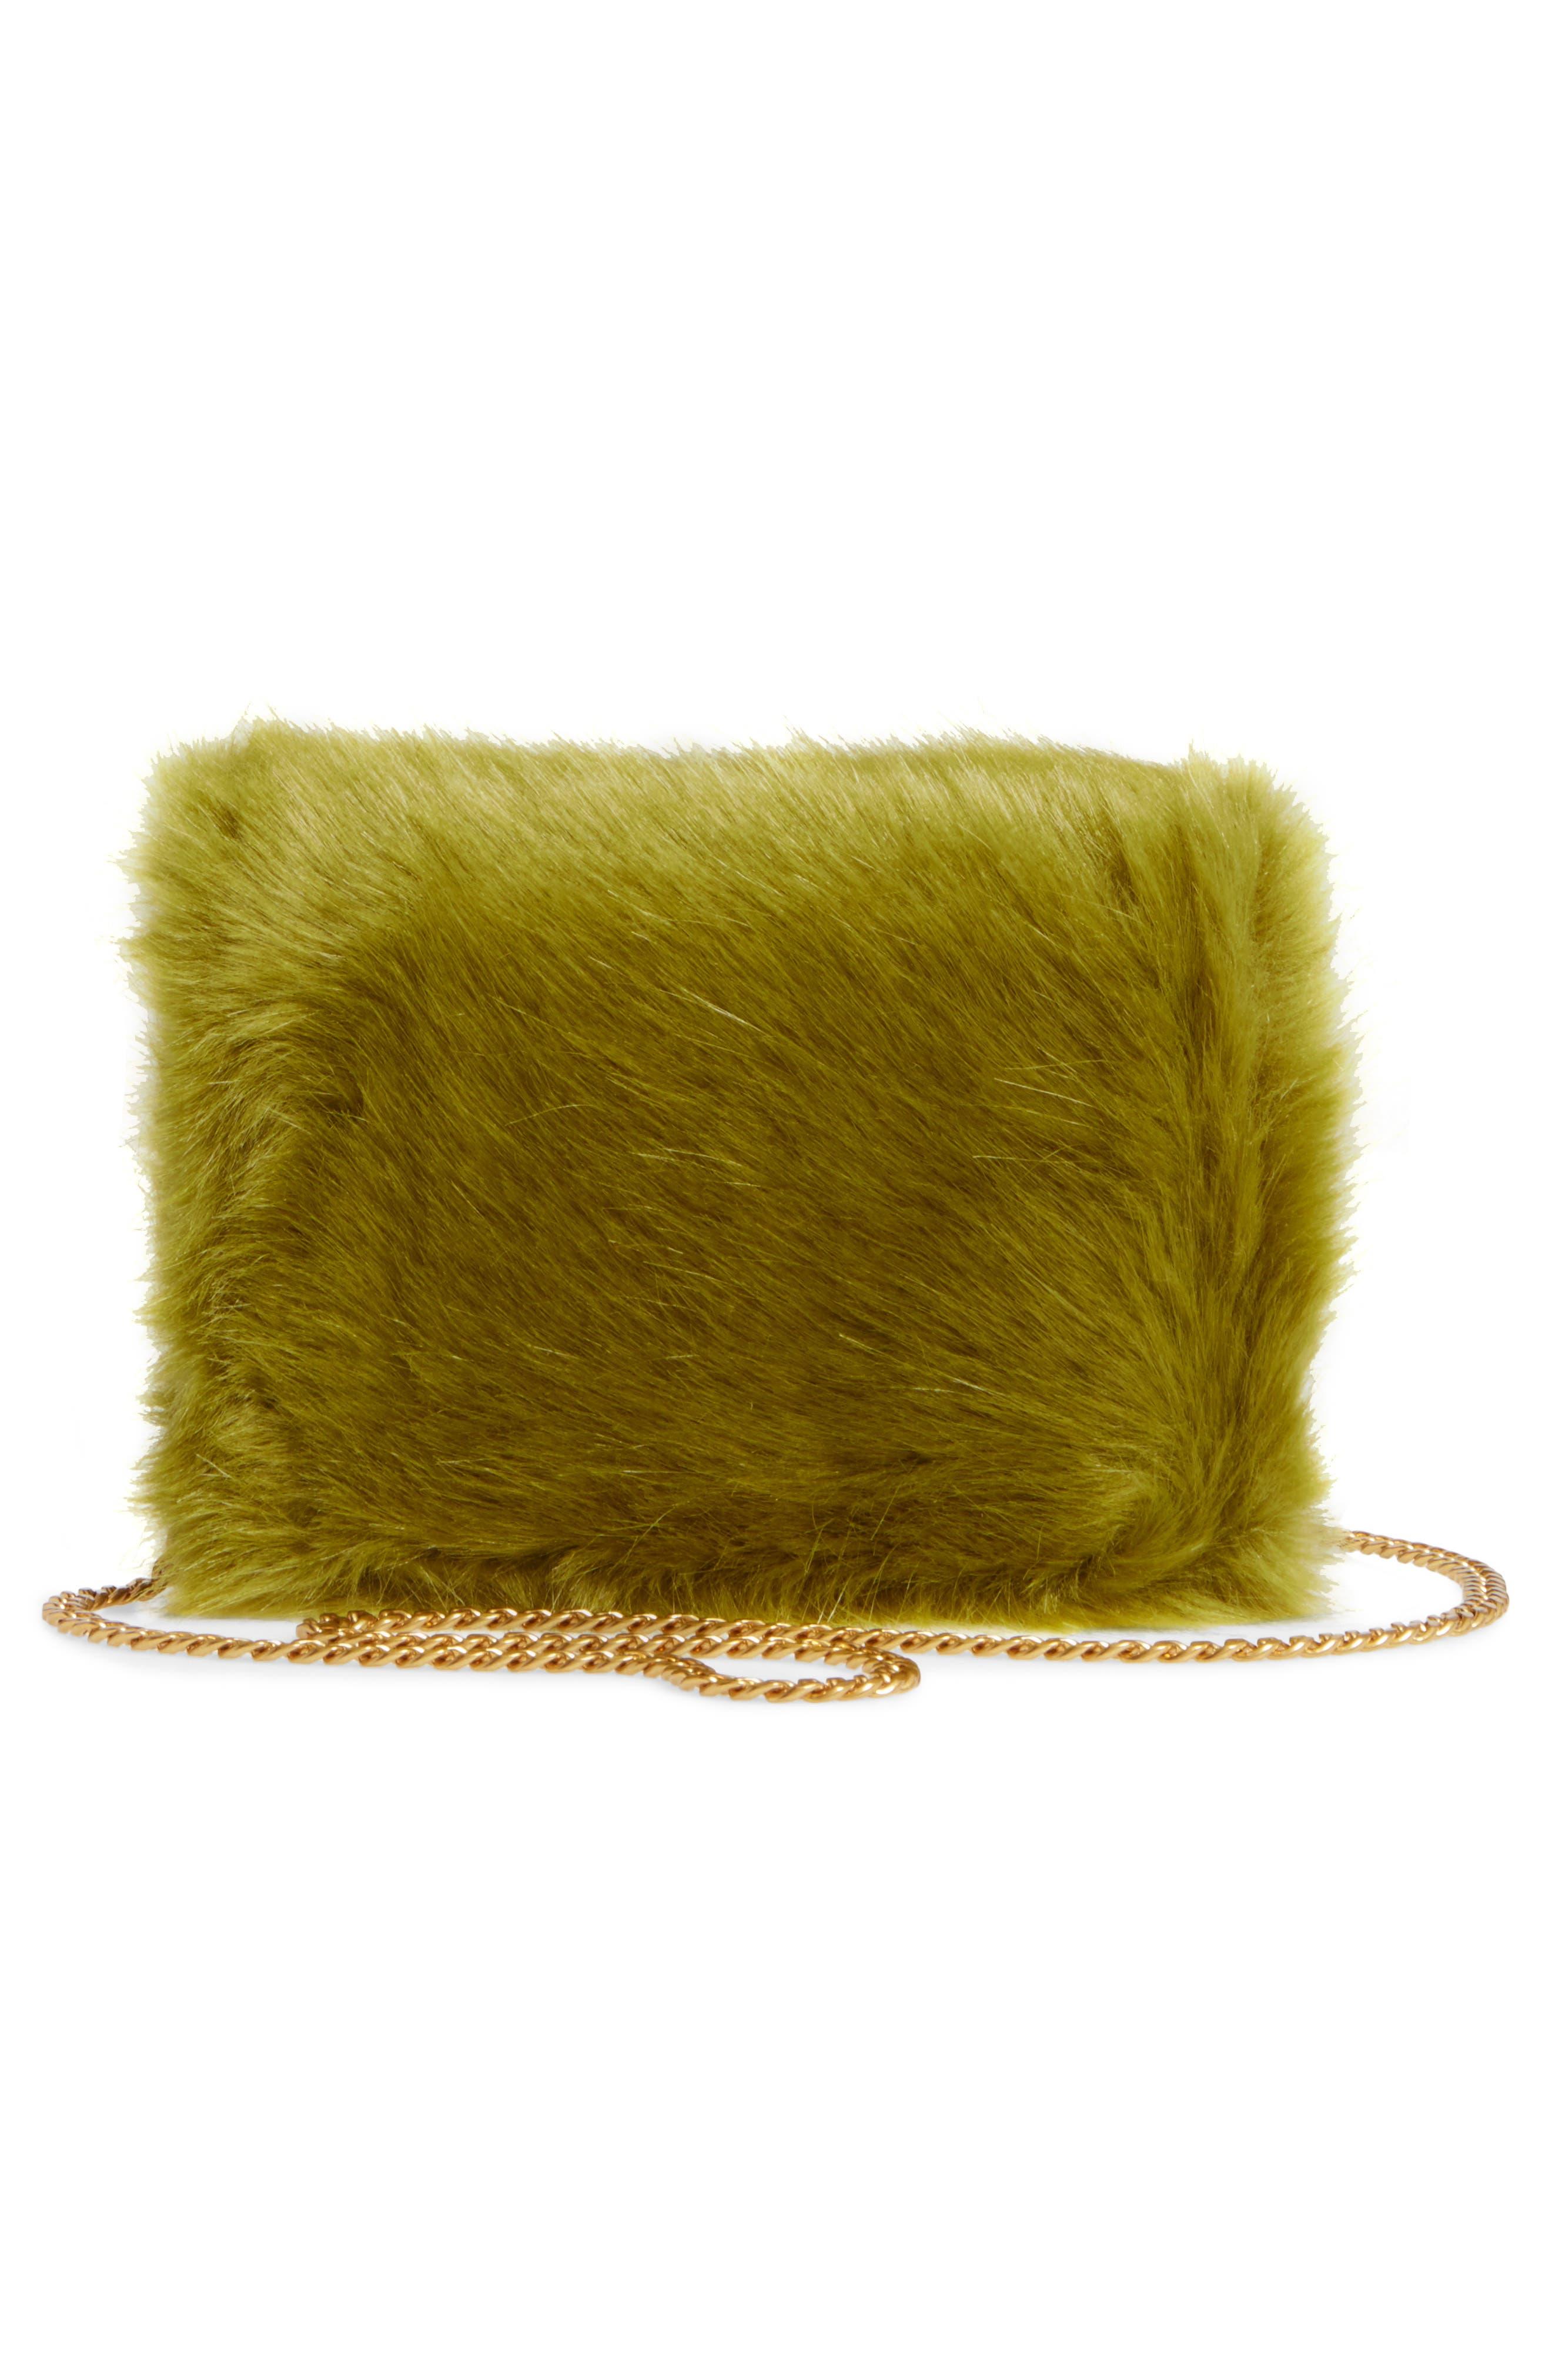 Alternate Image 3  - Tory Burch Mini Chelsea Faux Fur Convertible Crossbody Bag